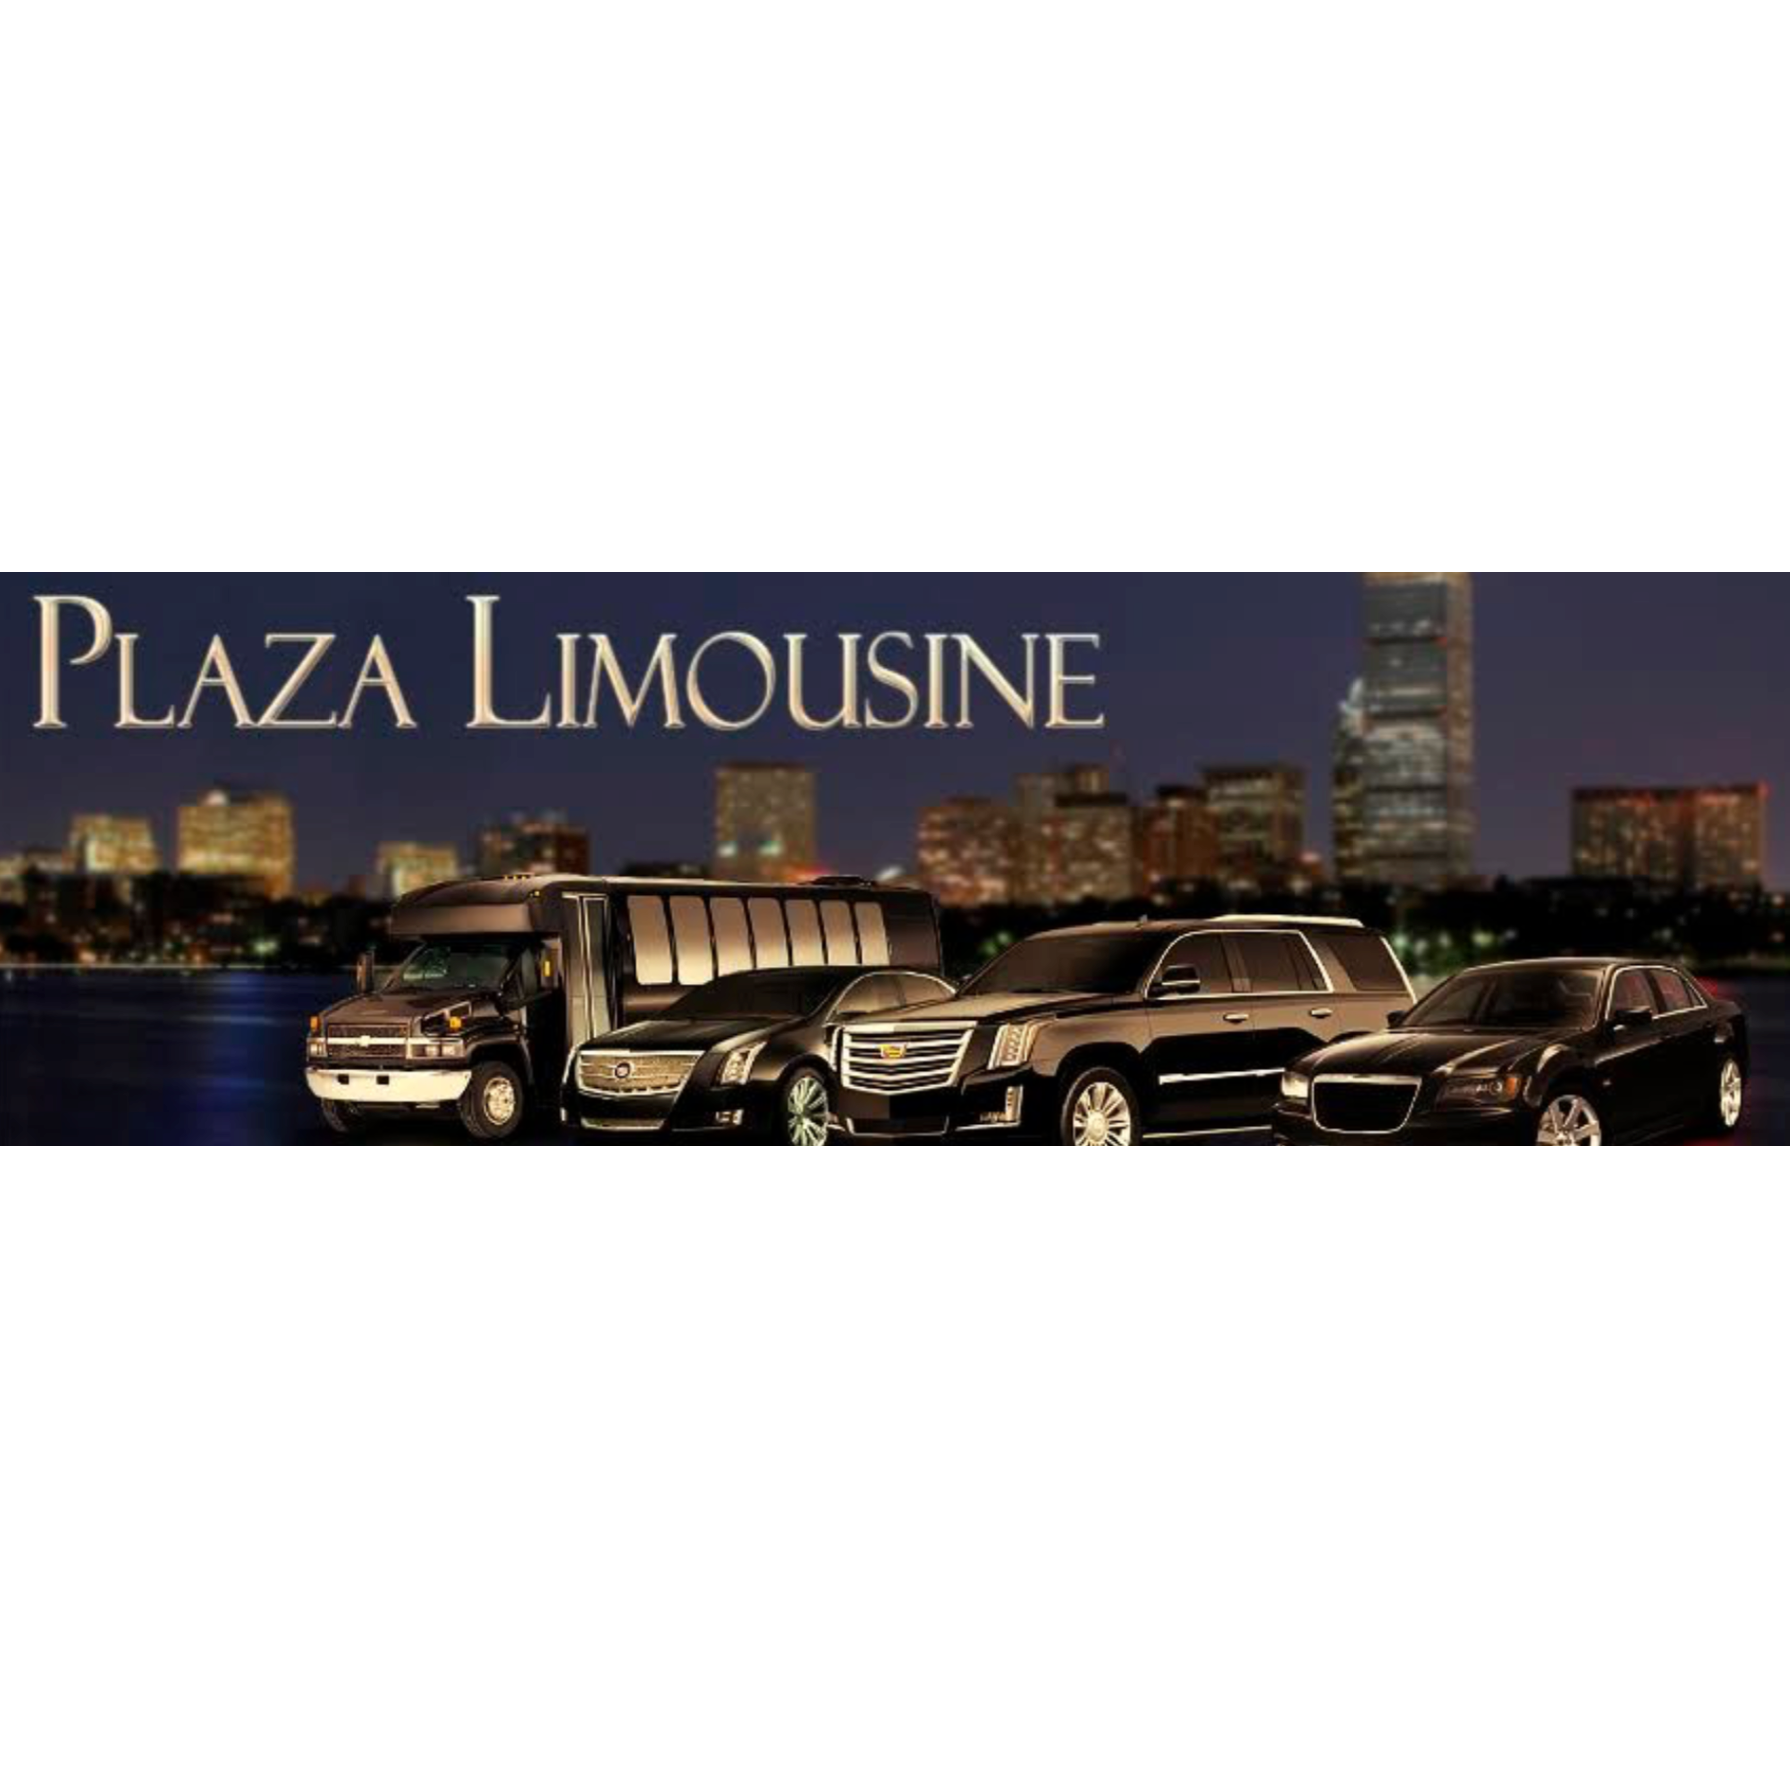 Plaza Limousine LTD logo